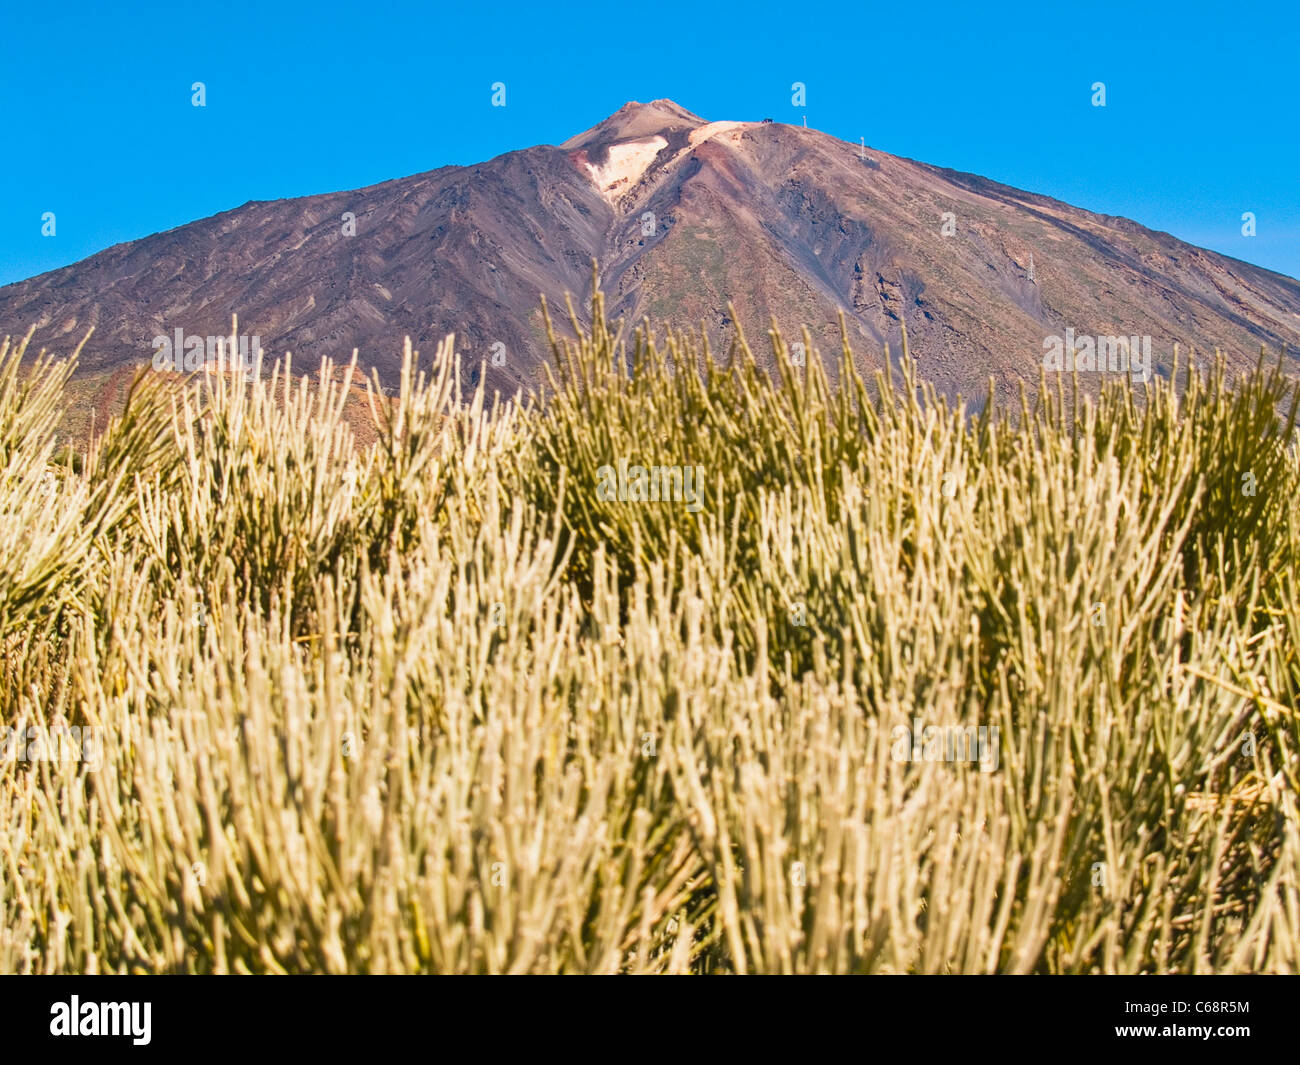 Der Teide Nationalpark Teneriffa, Kanarische Inseln-Spanien-Europa Stockbild